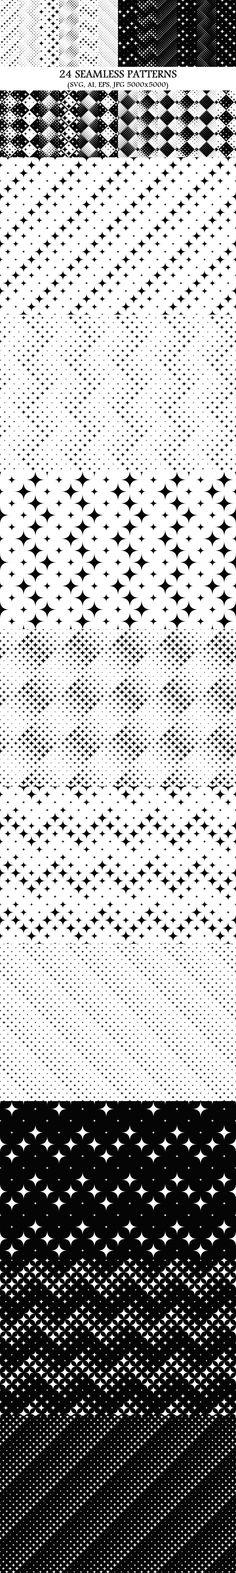 24 Seamless Star Patterns #PatternSet #geometry #RepeatingPattern #BackgroundSet #sale #starpattern #PremiumVectorBackground #PatternSets #CheapVectorBackground #PatternGraphics #background #discount #seamless #PatternCollection #DiscountBackgrounds #SeamlessPatterns #BackgroundGraphic #BackgroundBundles #BackgroundGraphics